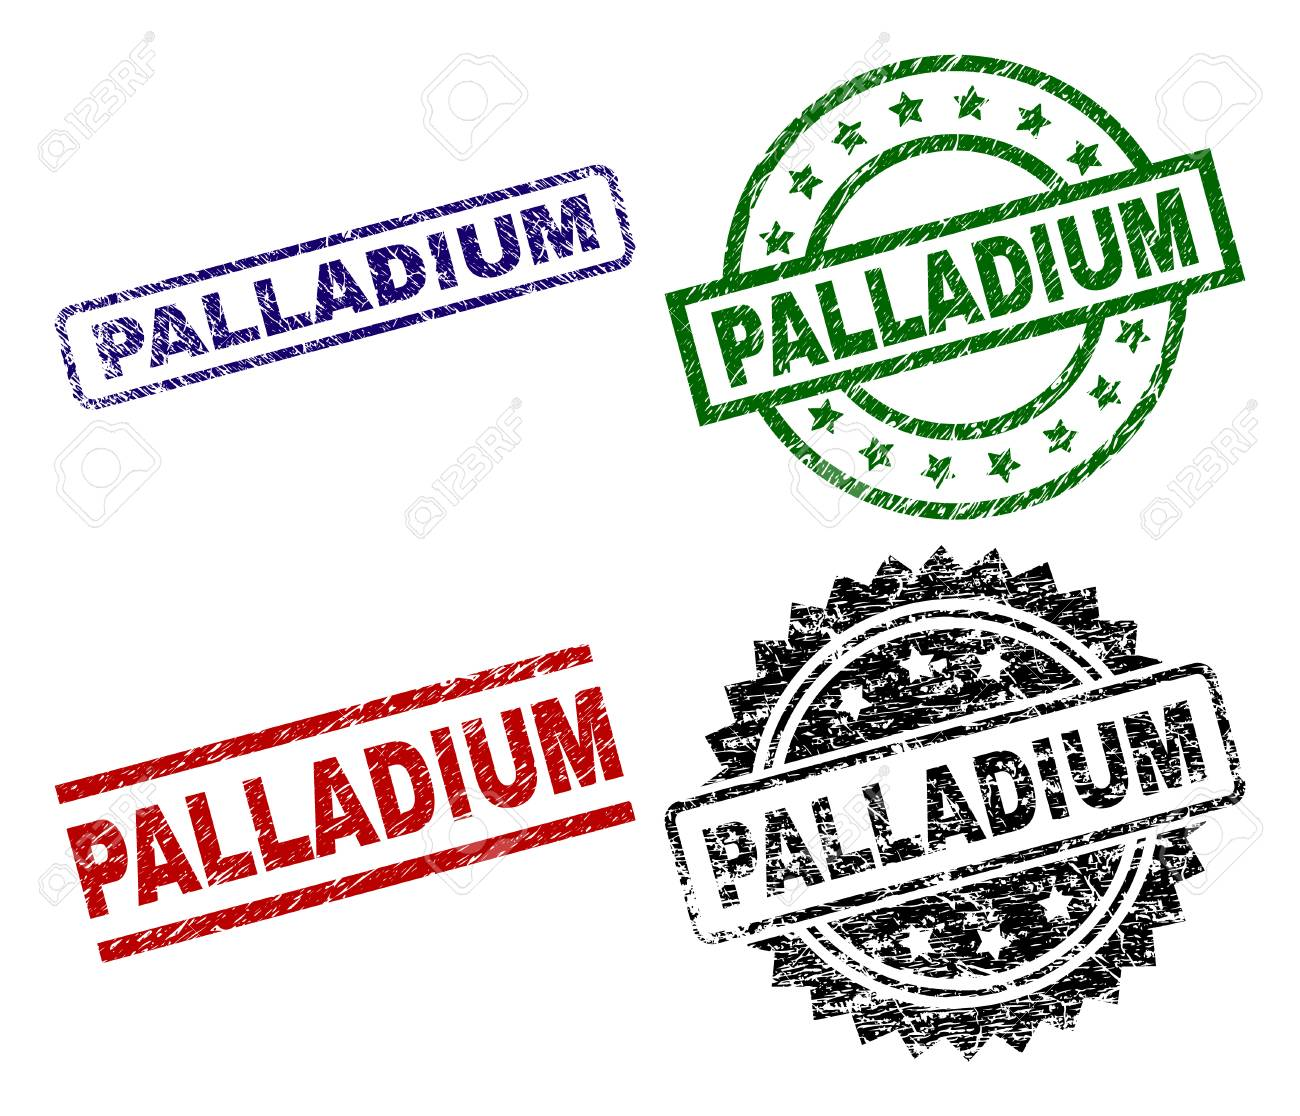 olika stilar Storbritannien bra erbjudanden 2017 PALLADIUM Seal Prints With Corroded Texture. Black, Green,red,blue ...